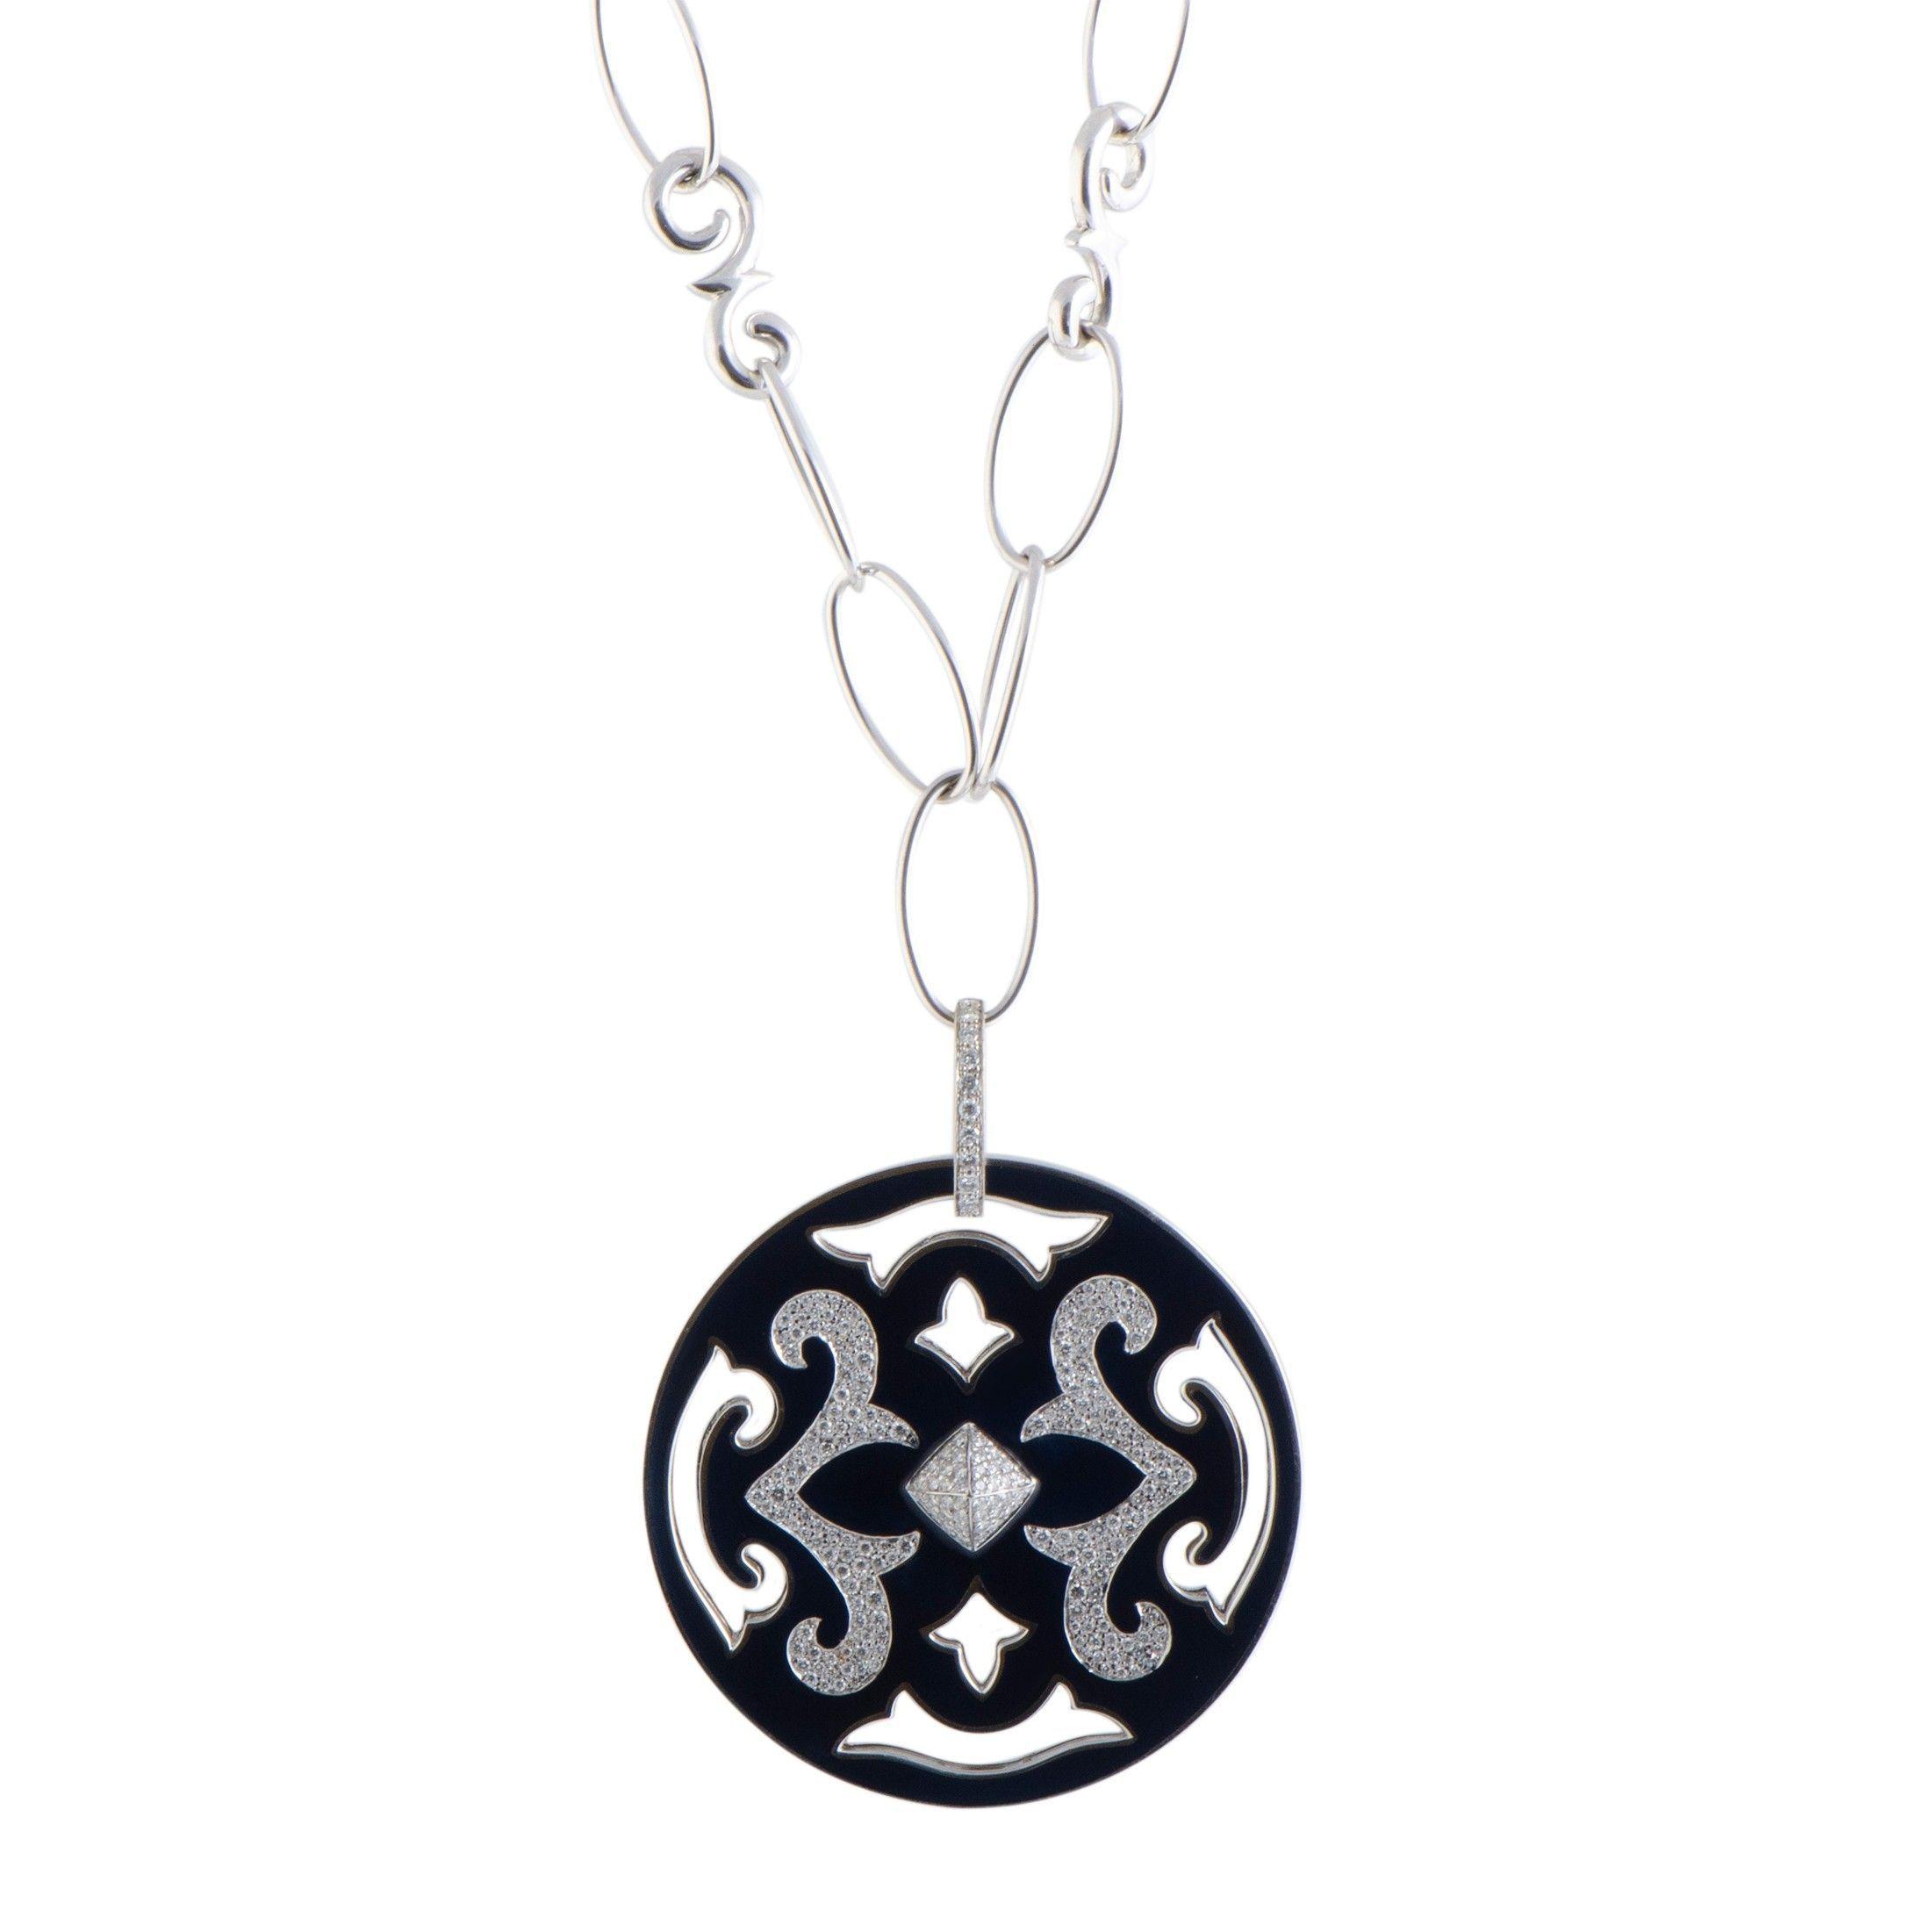 Nouvelle Bague 18K White Gold Diamond Pave And Black Enamel Round Pendant  Long Necklace Inside Current Pavé Star Locket Element Necklaces (Gallery 16 of 25)